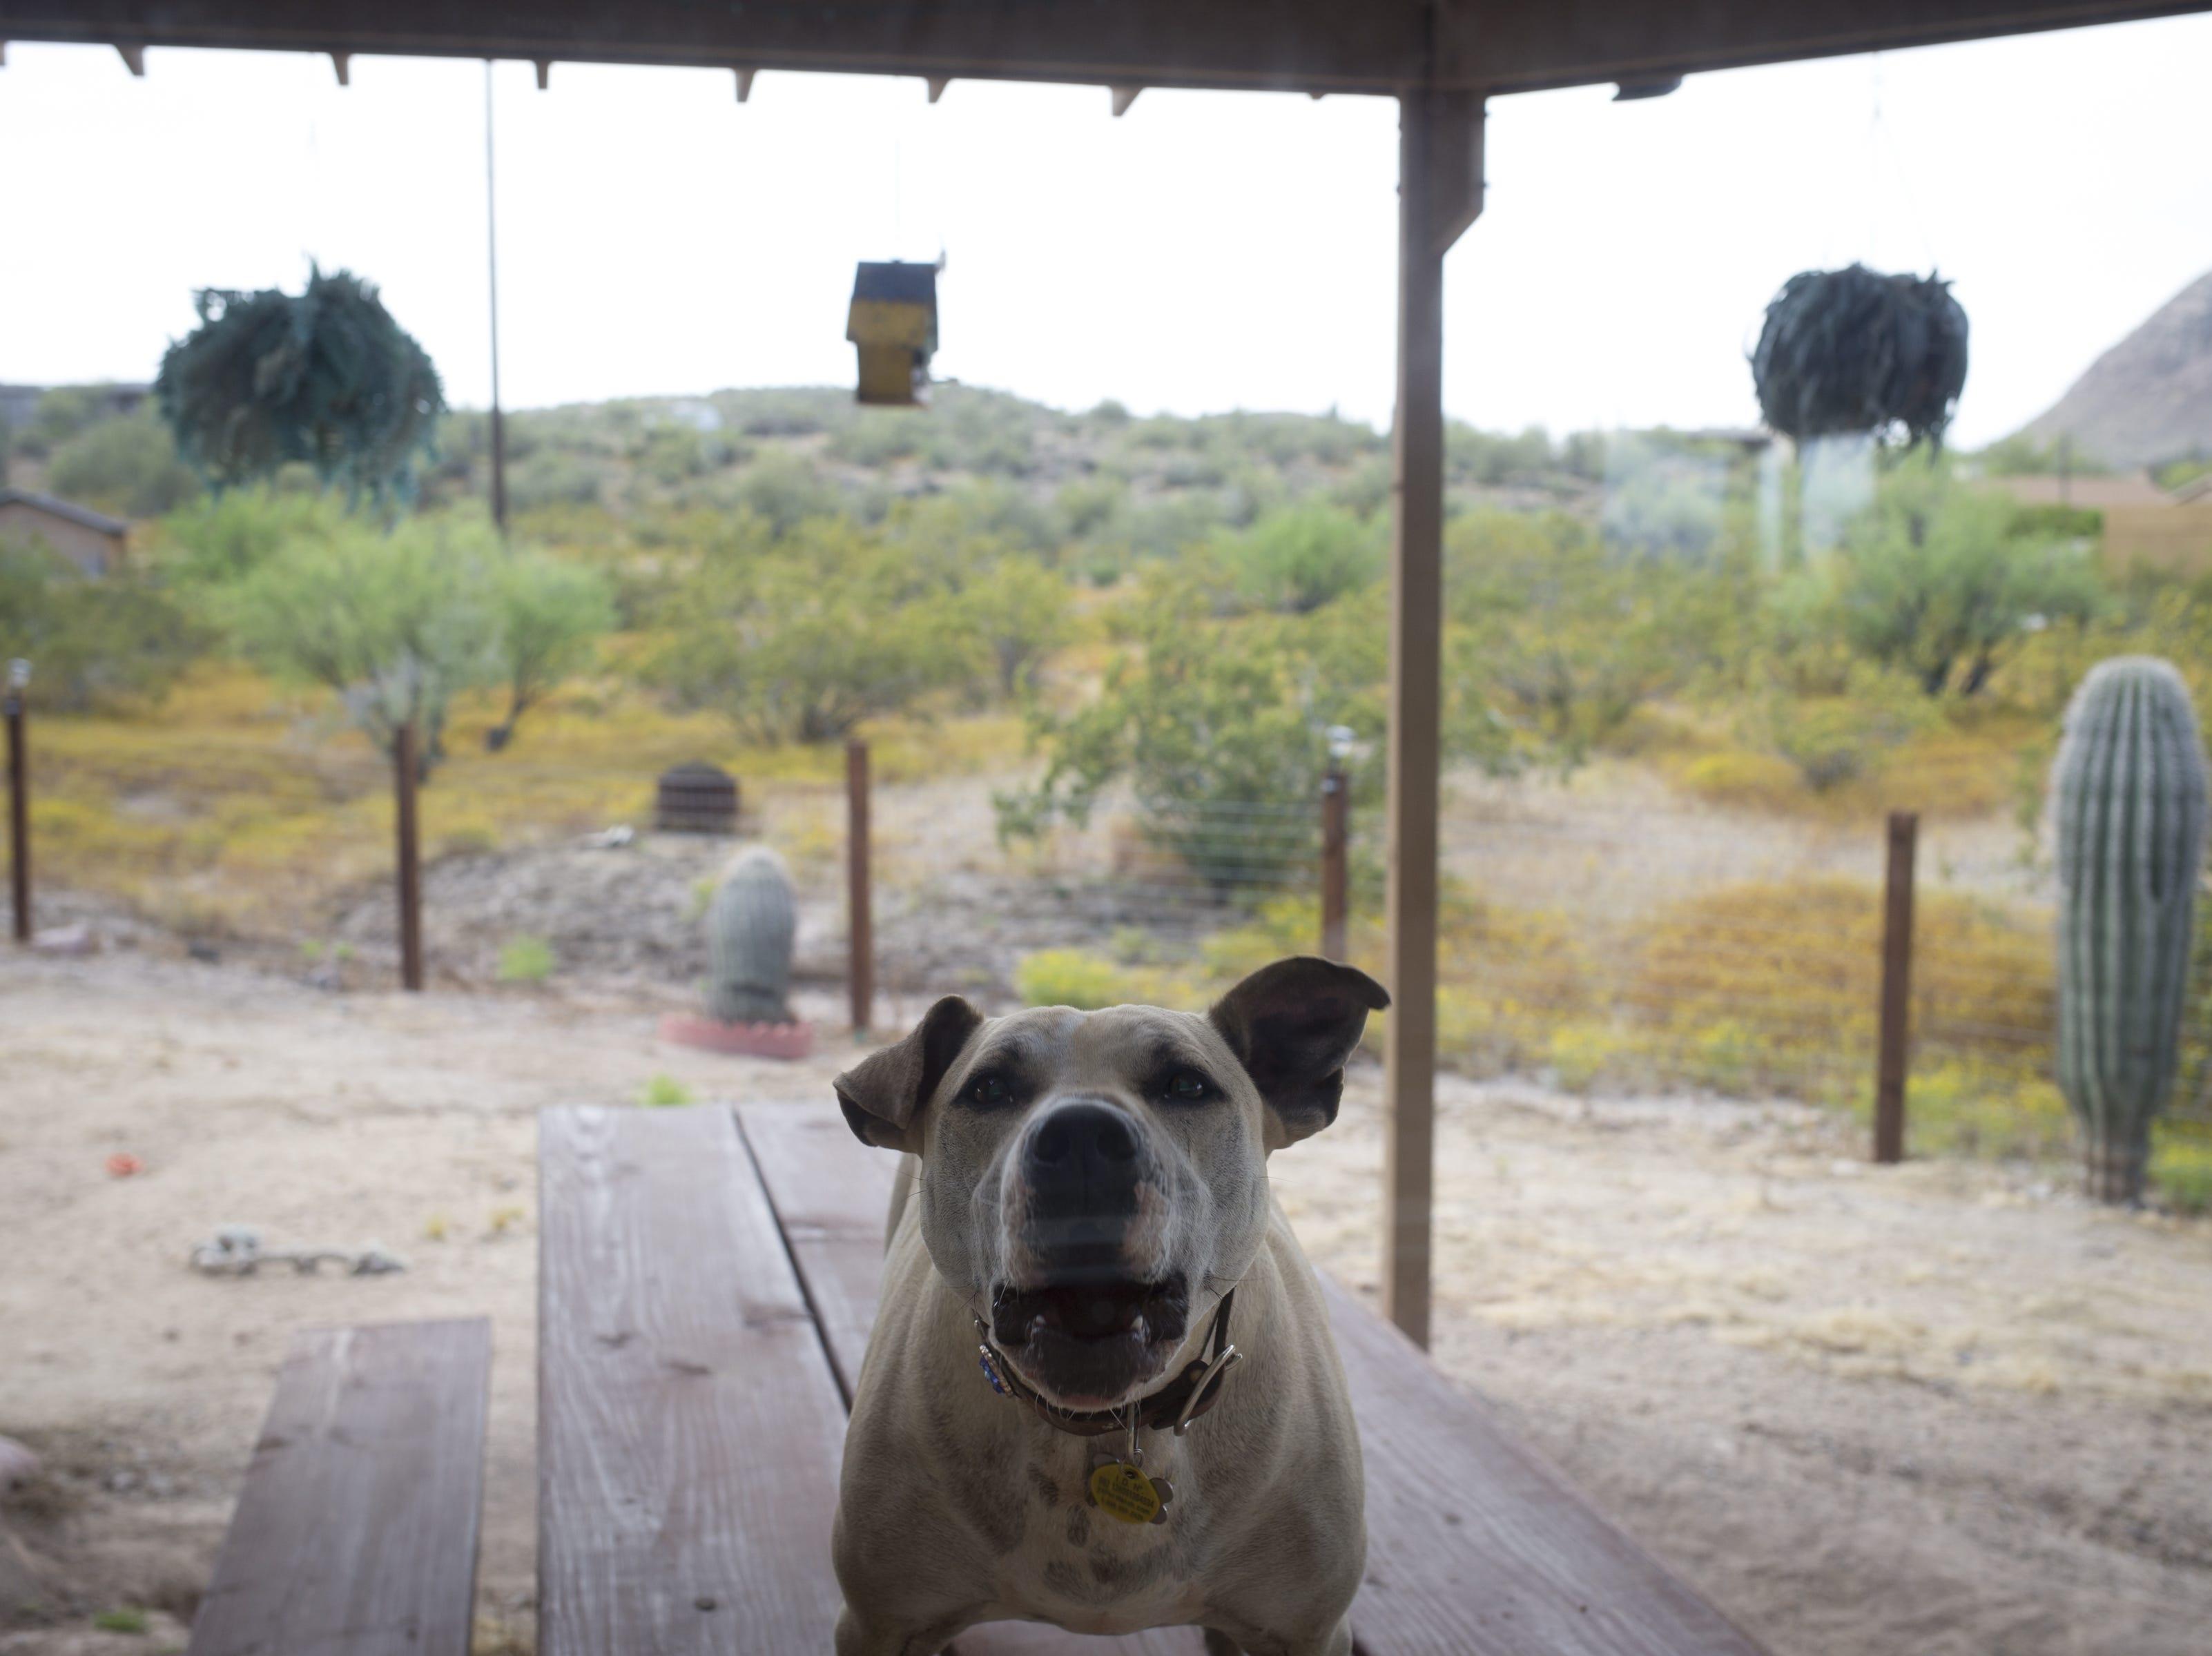 Lincoln, Mary Gevarter's dog, barks at visitors, April 23, 2019, New River.